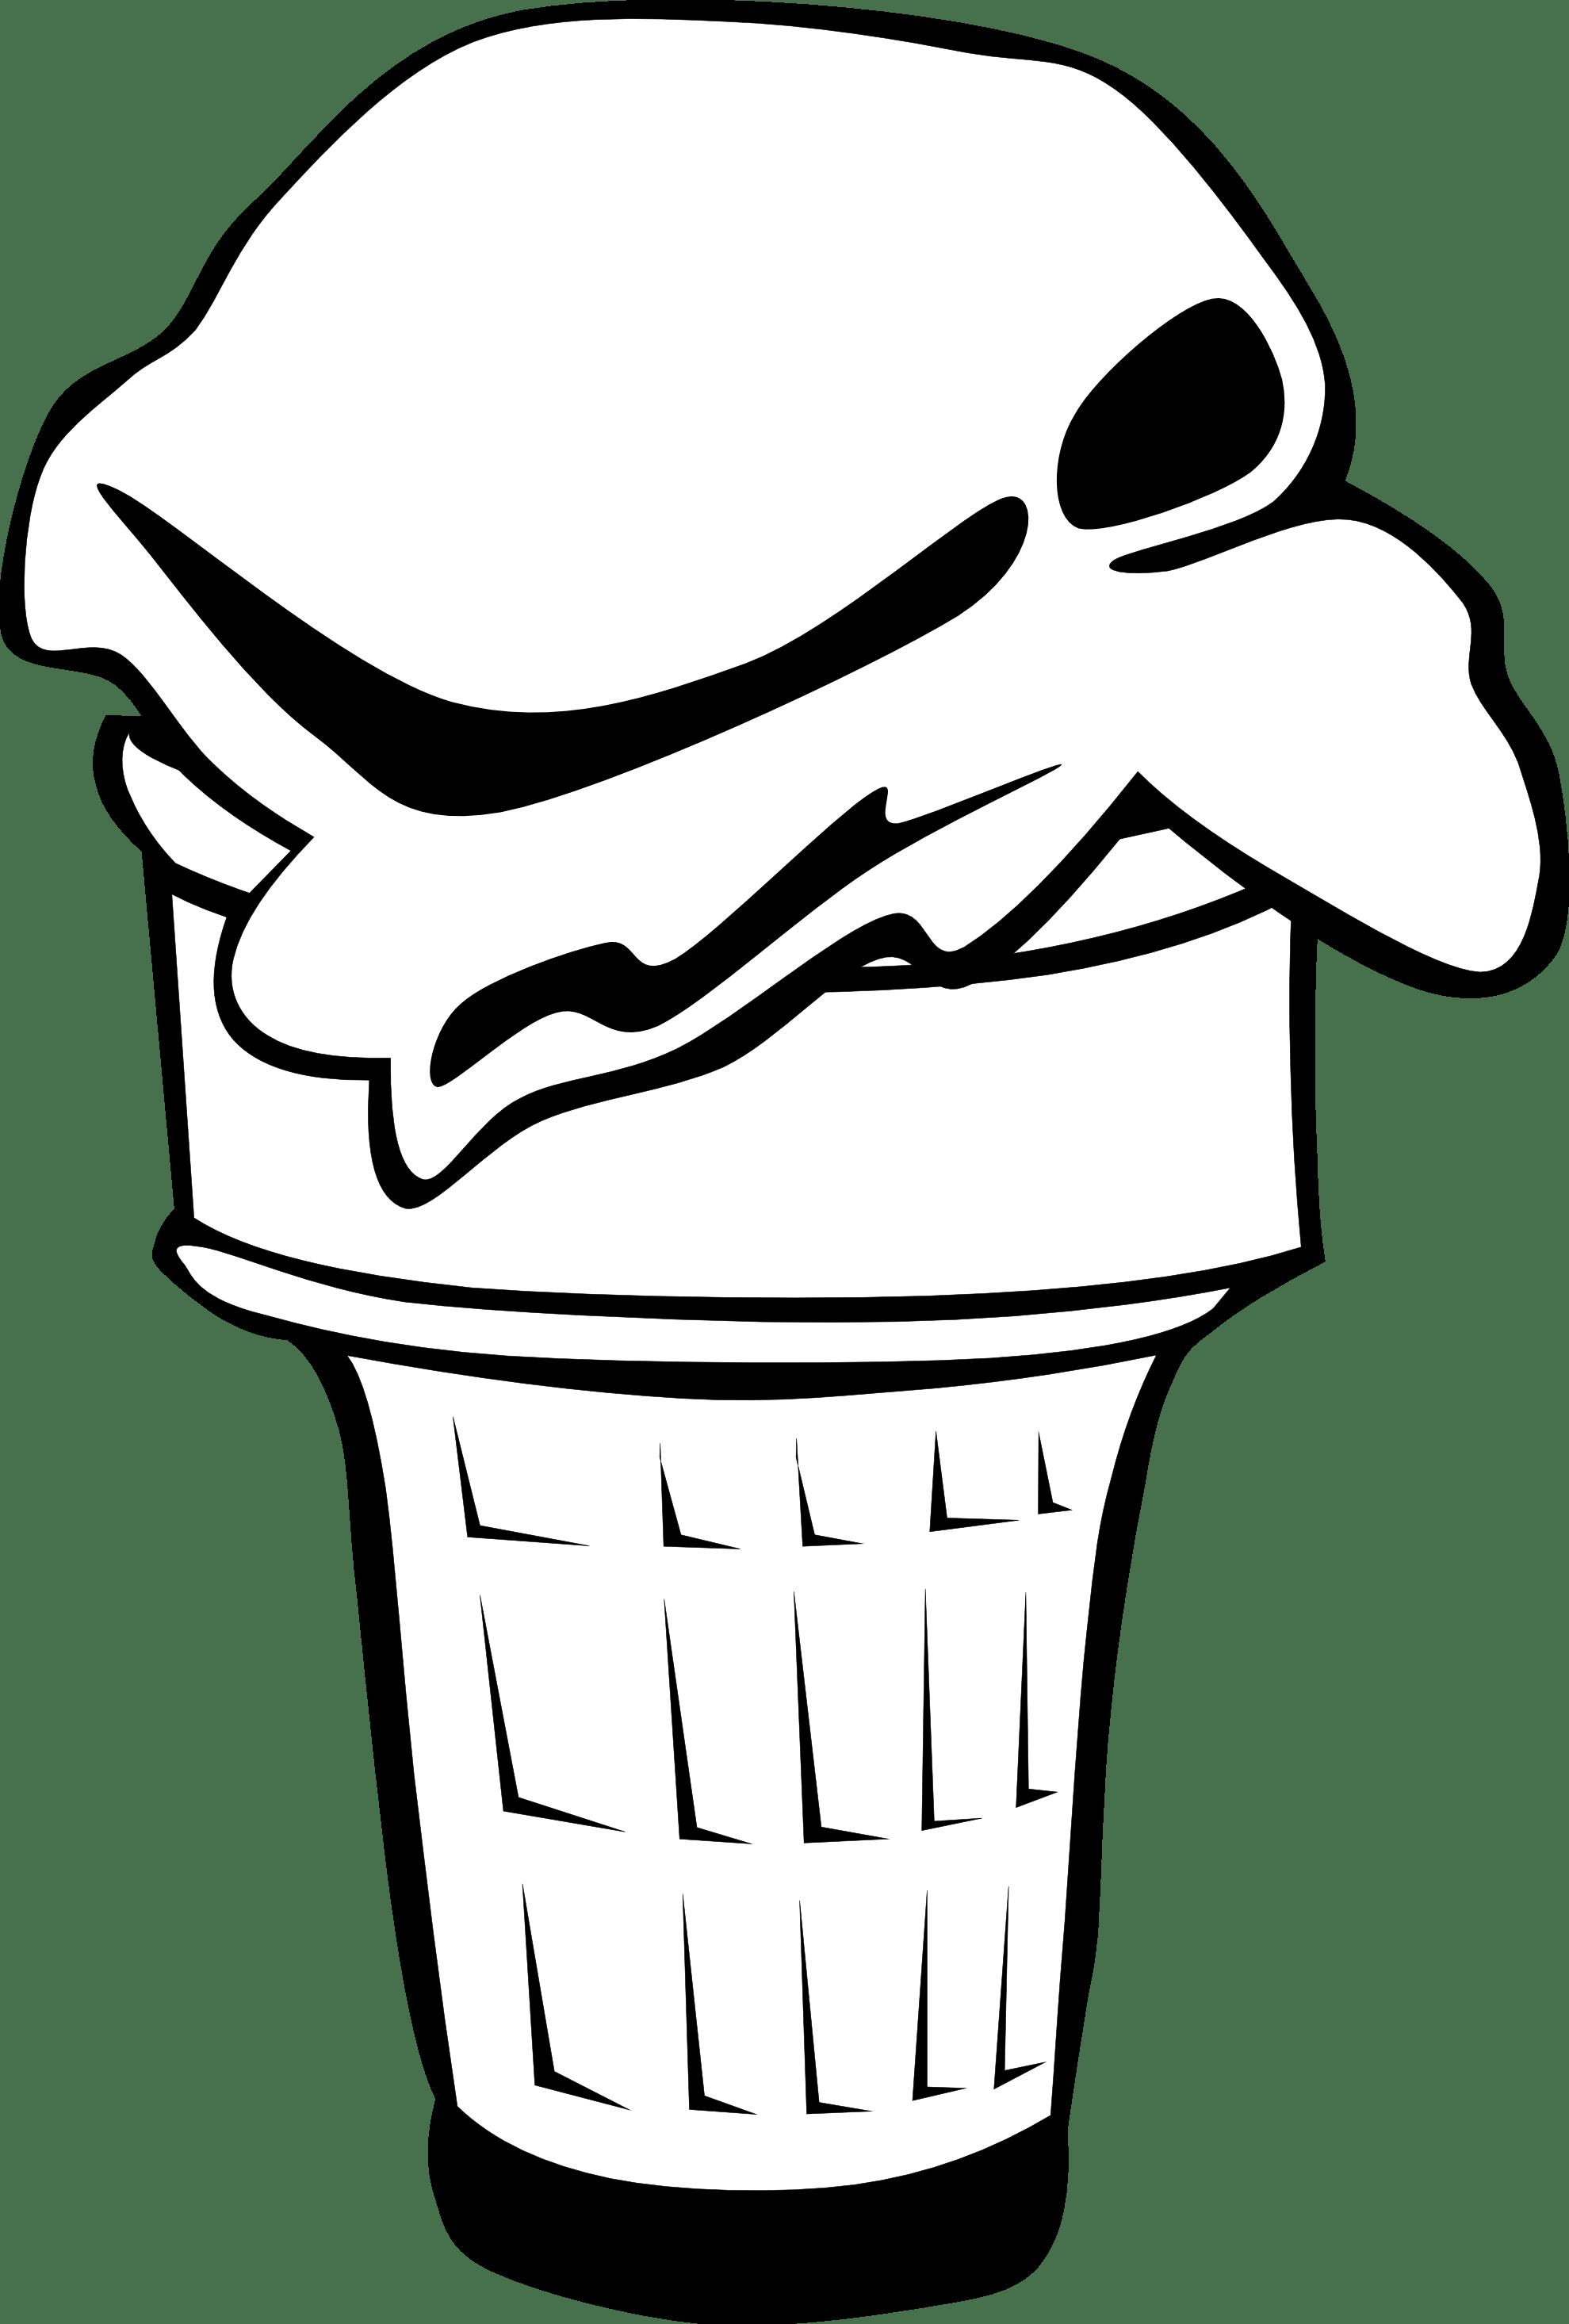 Ice Cream Clipart Black And White